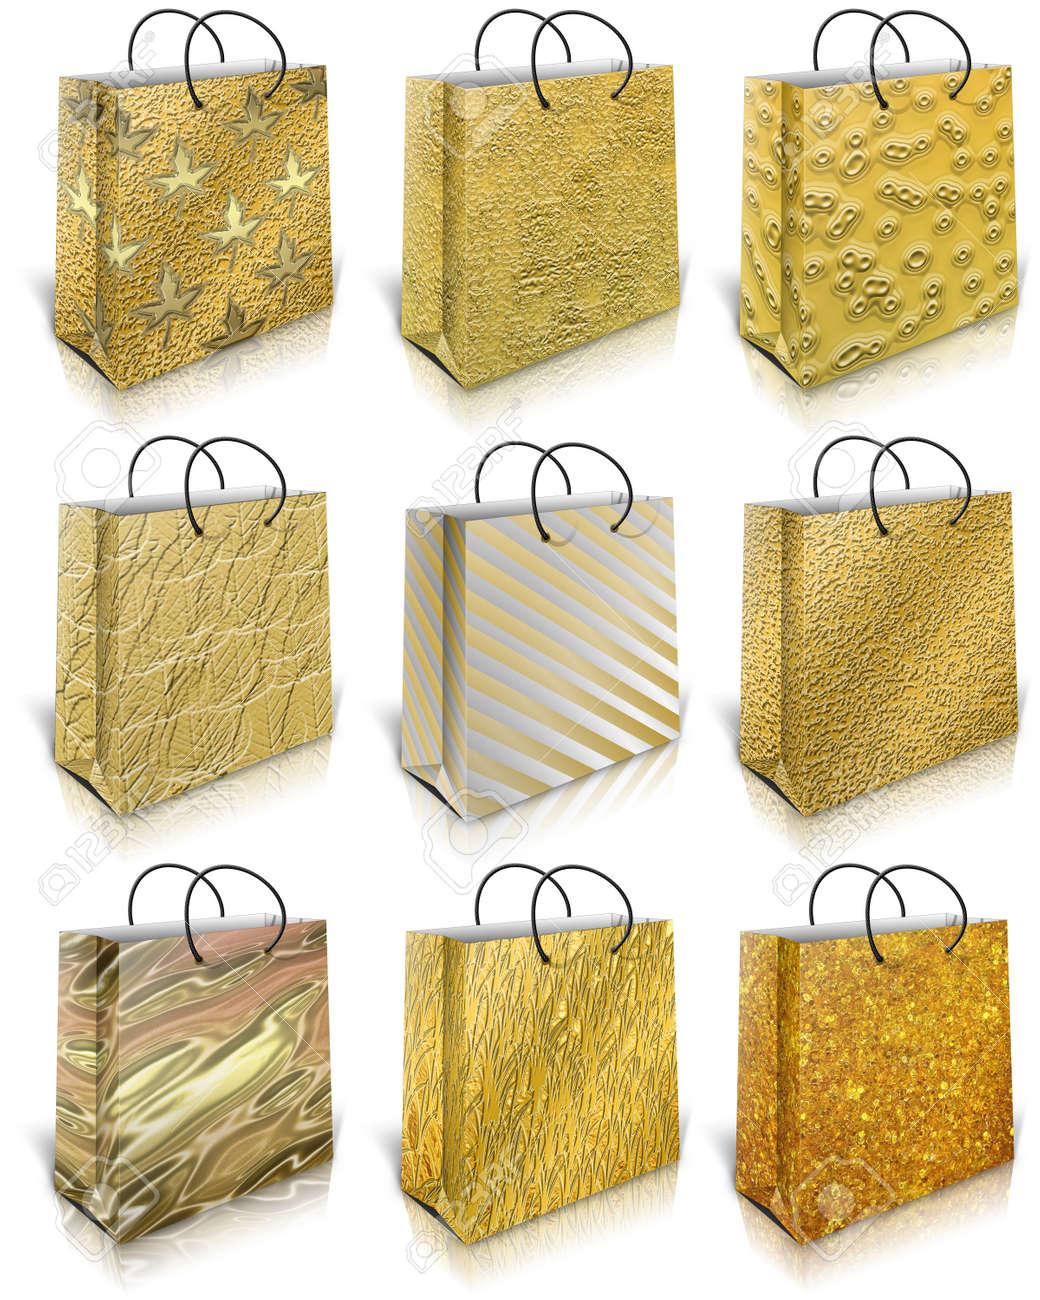 Nine gold gift bag isolated on white background Stock Photo - 11721330  sc 1 st  123RF.com & Nine Gold Gift Bag Isolated On White Background Stock Photo Picture ...